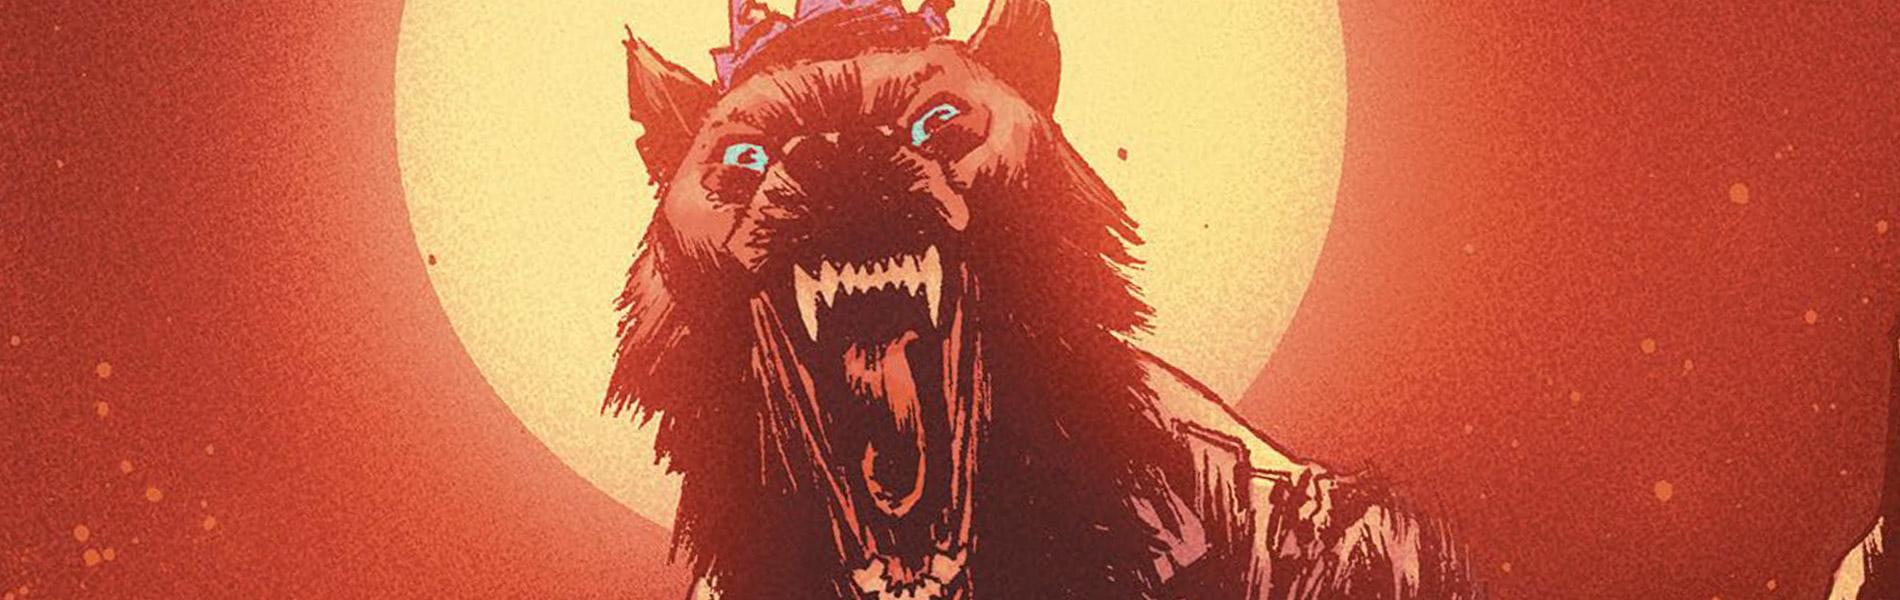 God of Comics – Jughead: The Hunger #2